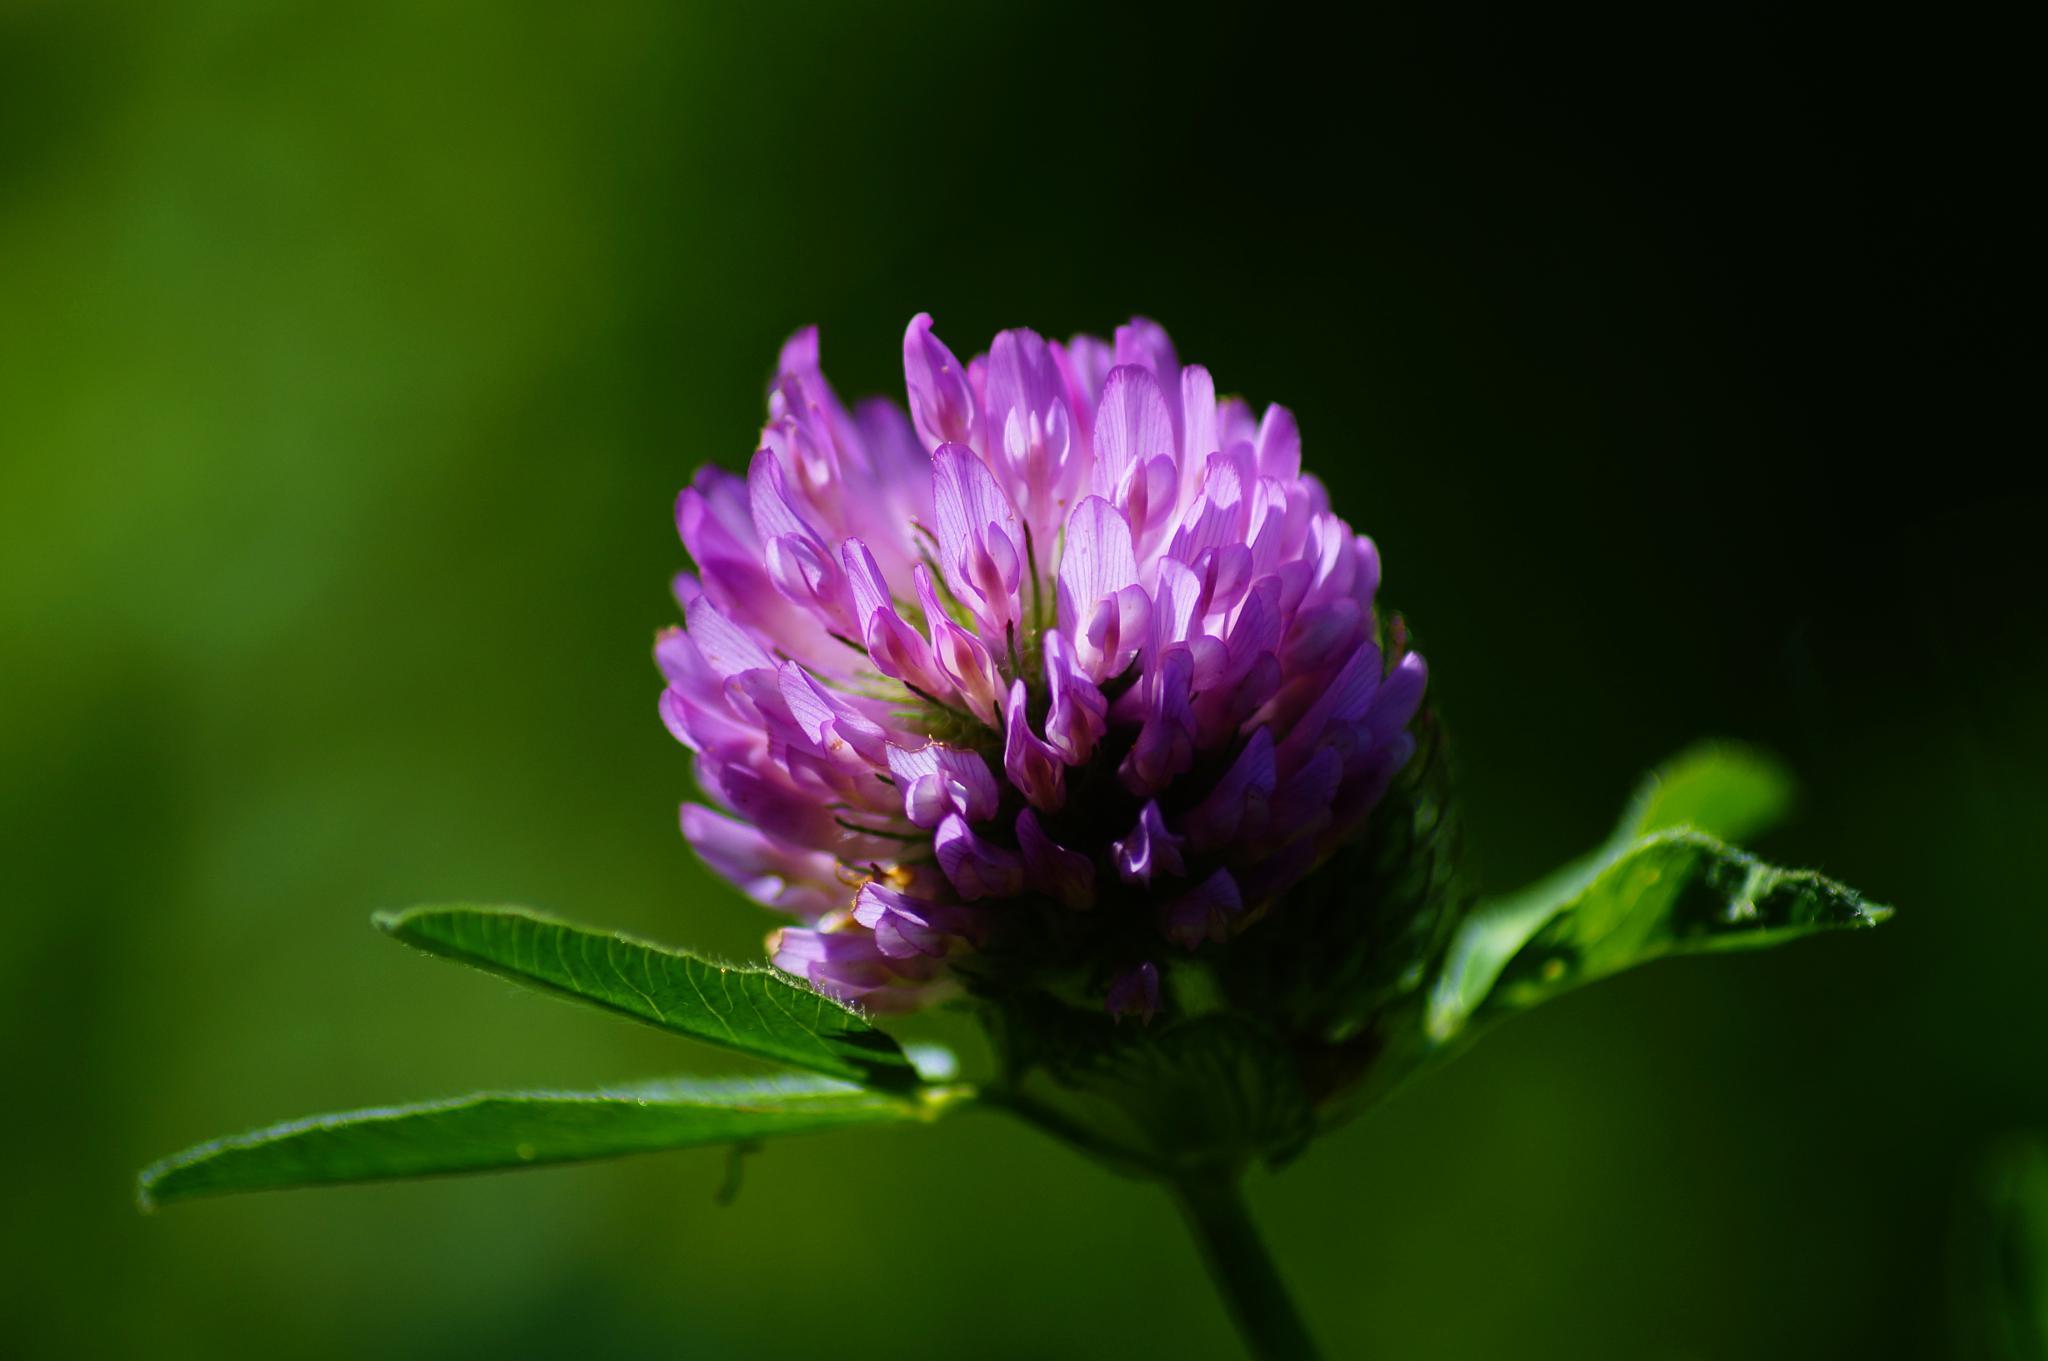 clover by lisbeth.westergaard